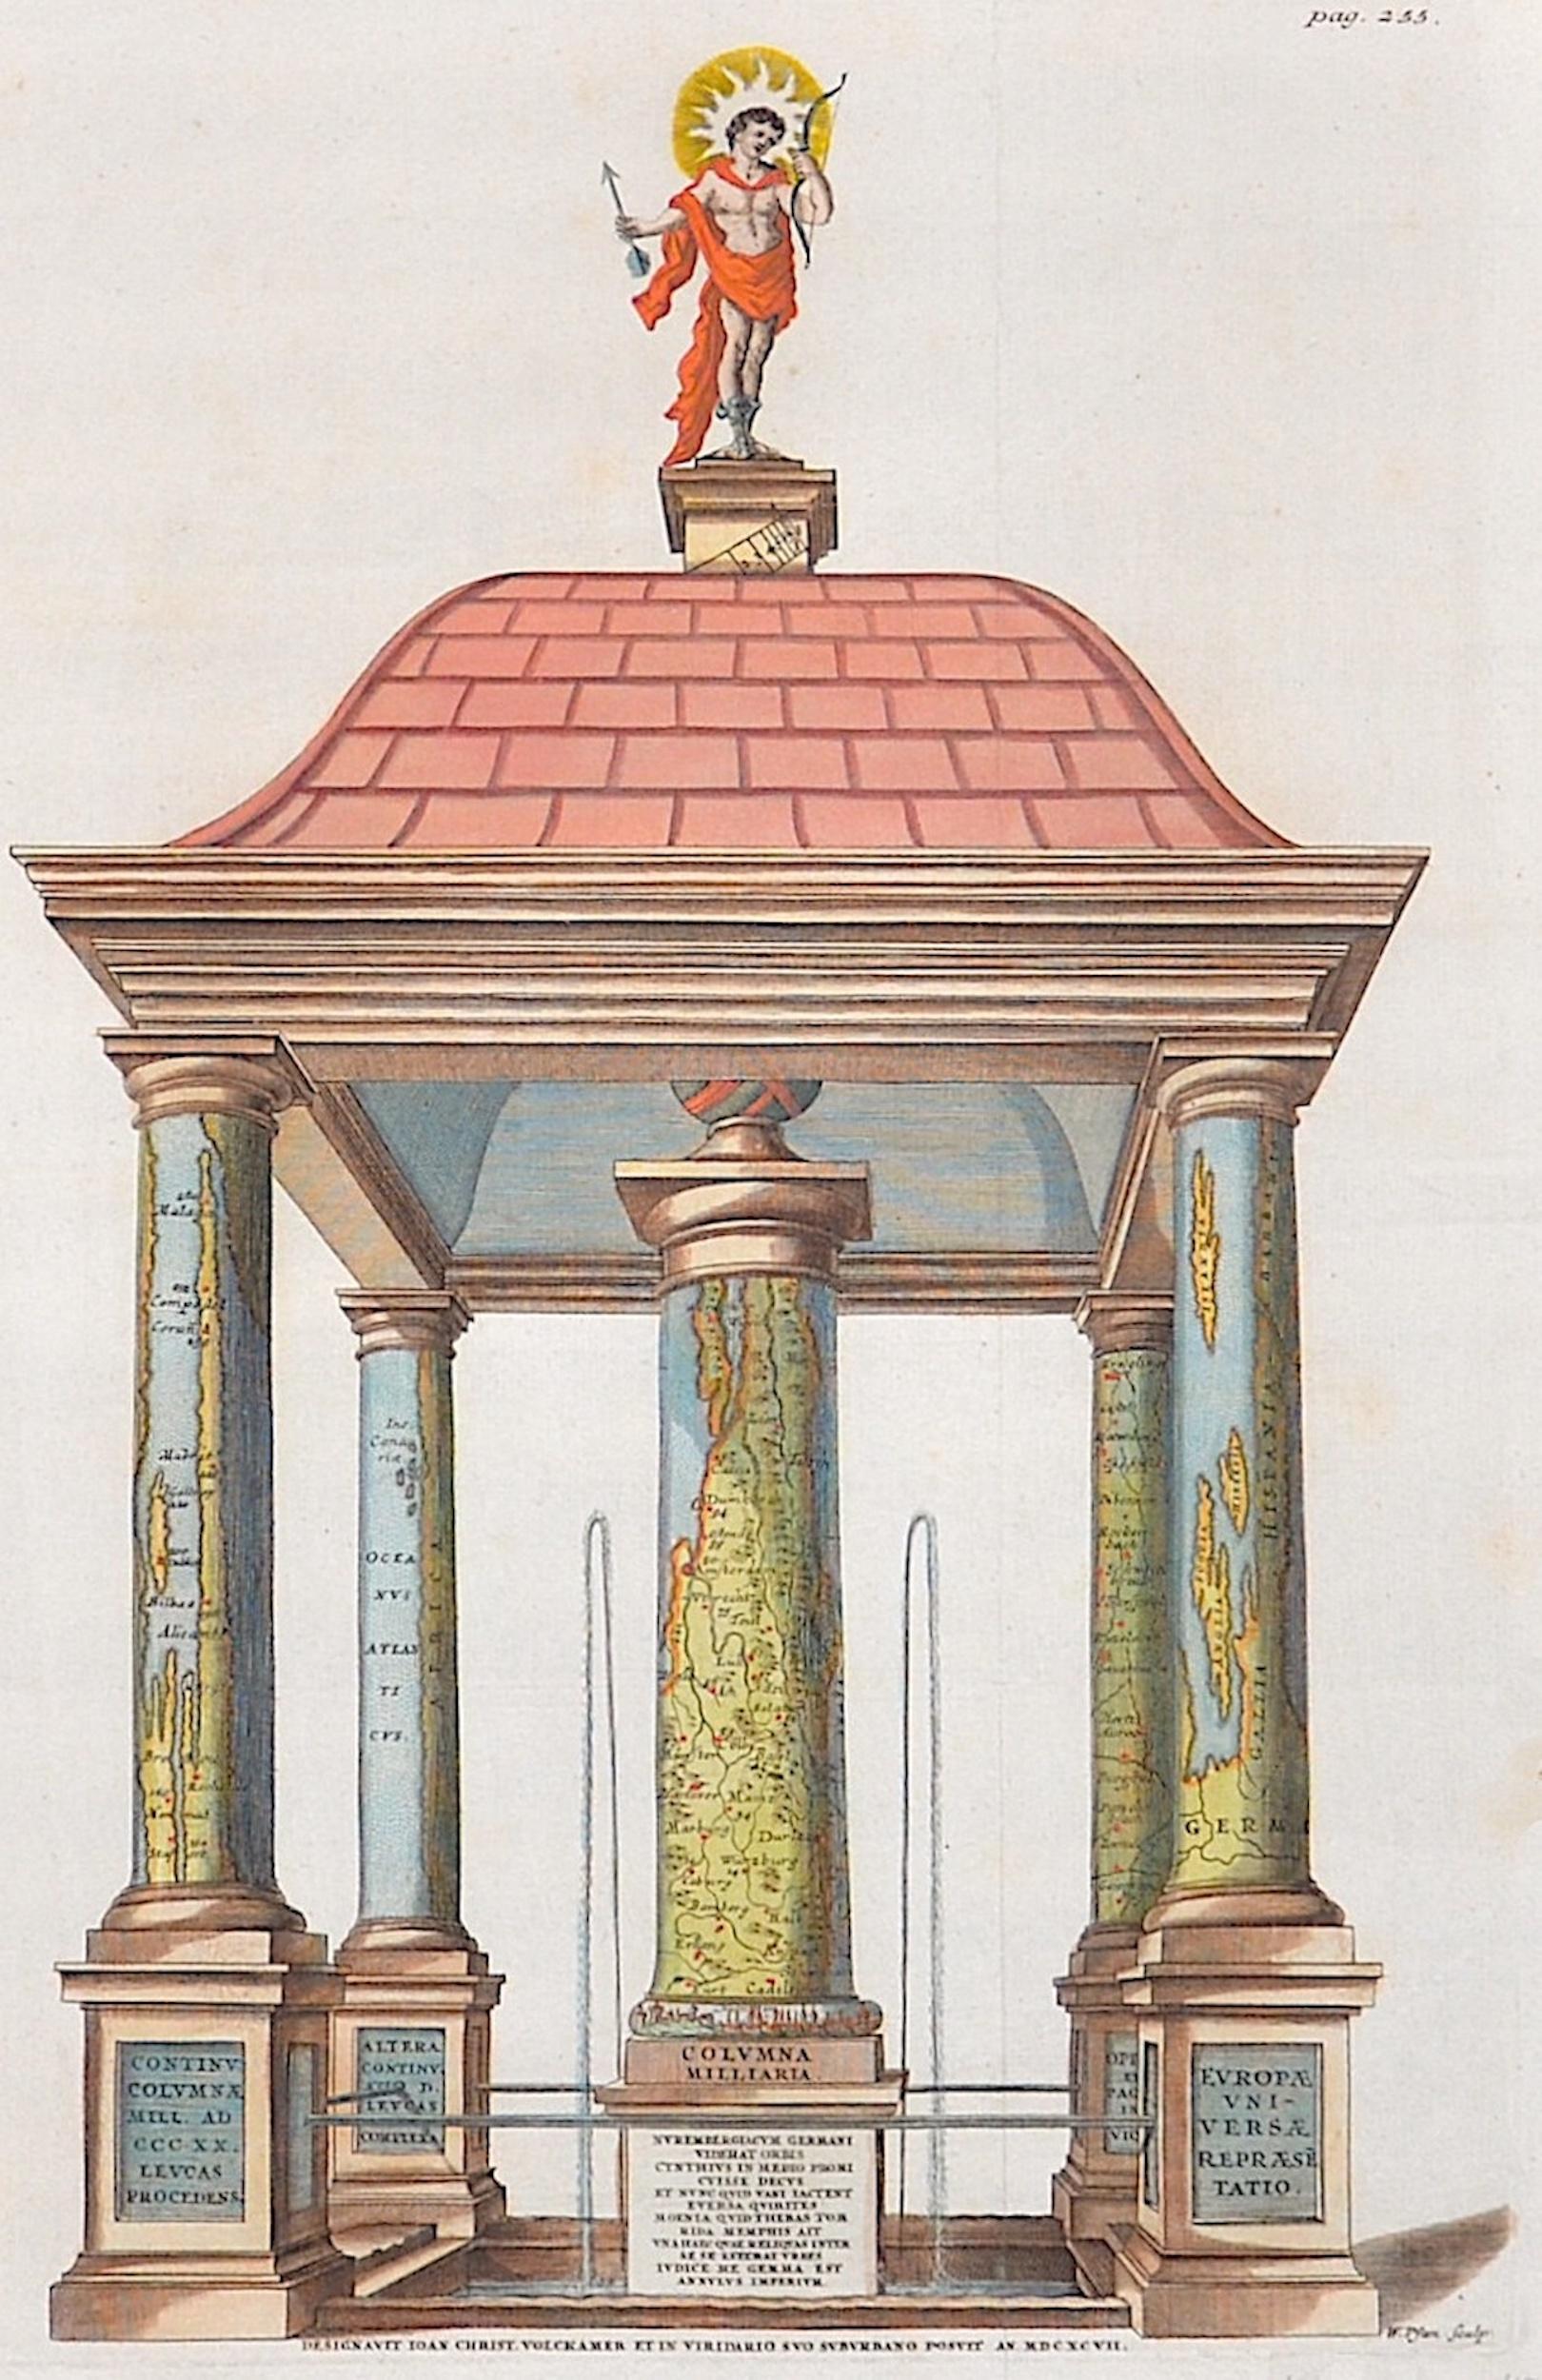 Pfan  Designavit Joan Christ Volkammer et in viridario suo suborbano posvif an.MDCXCVII